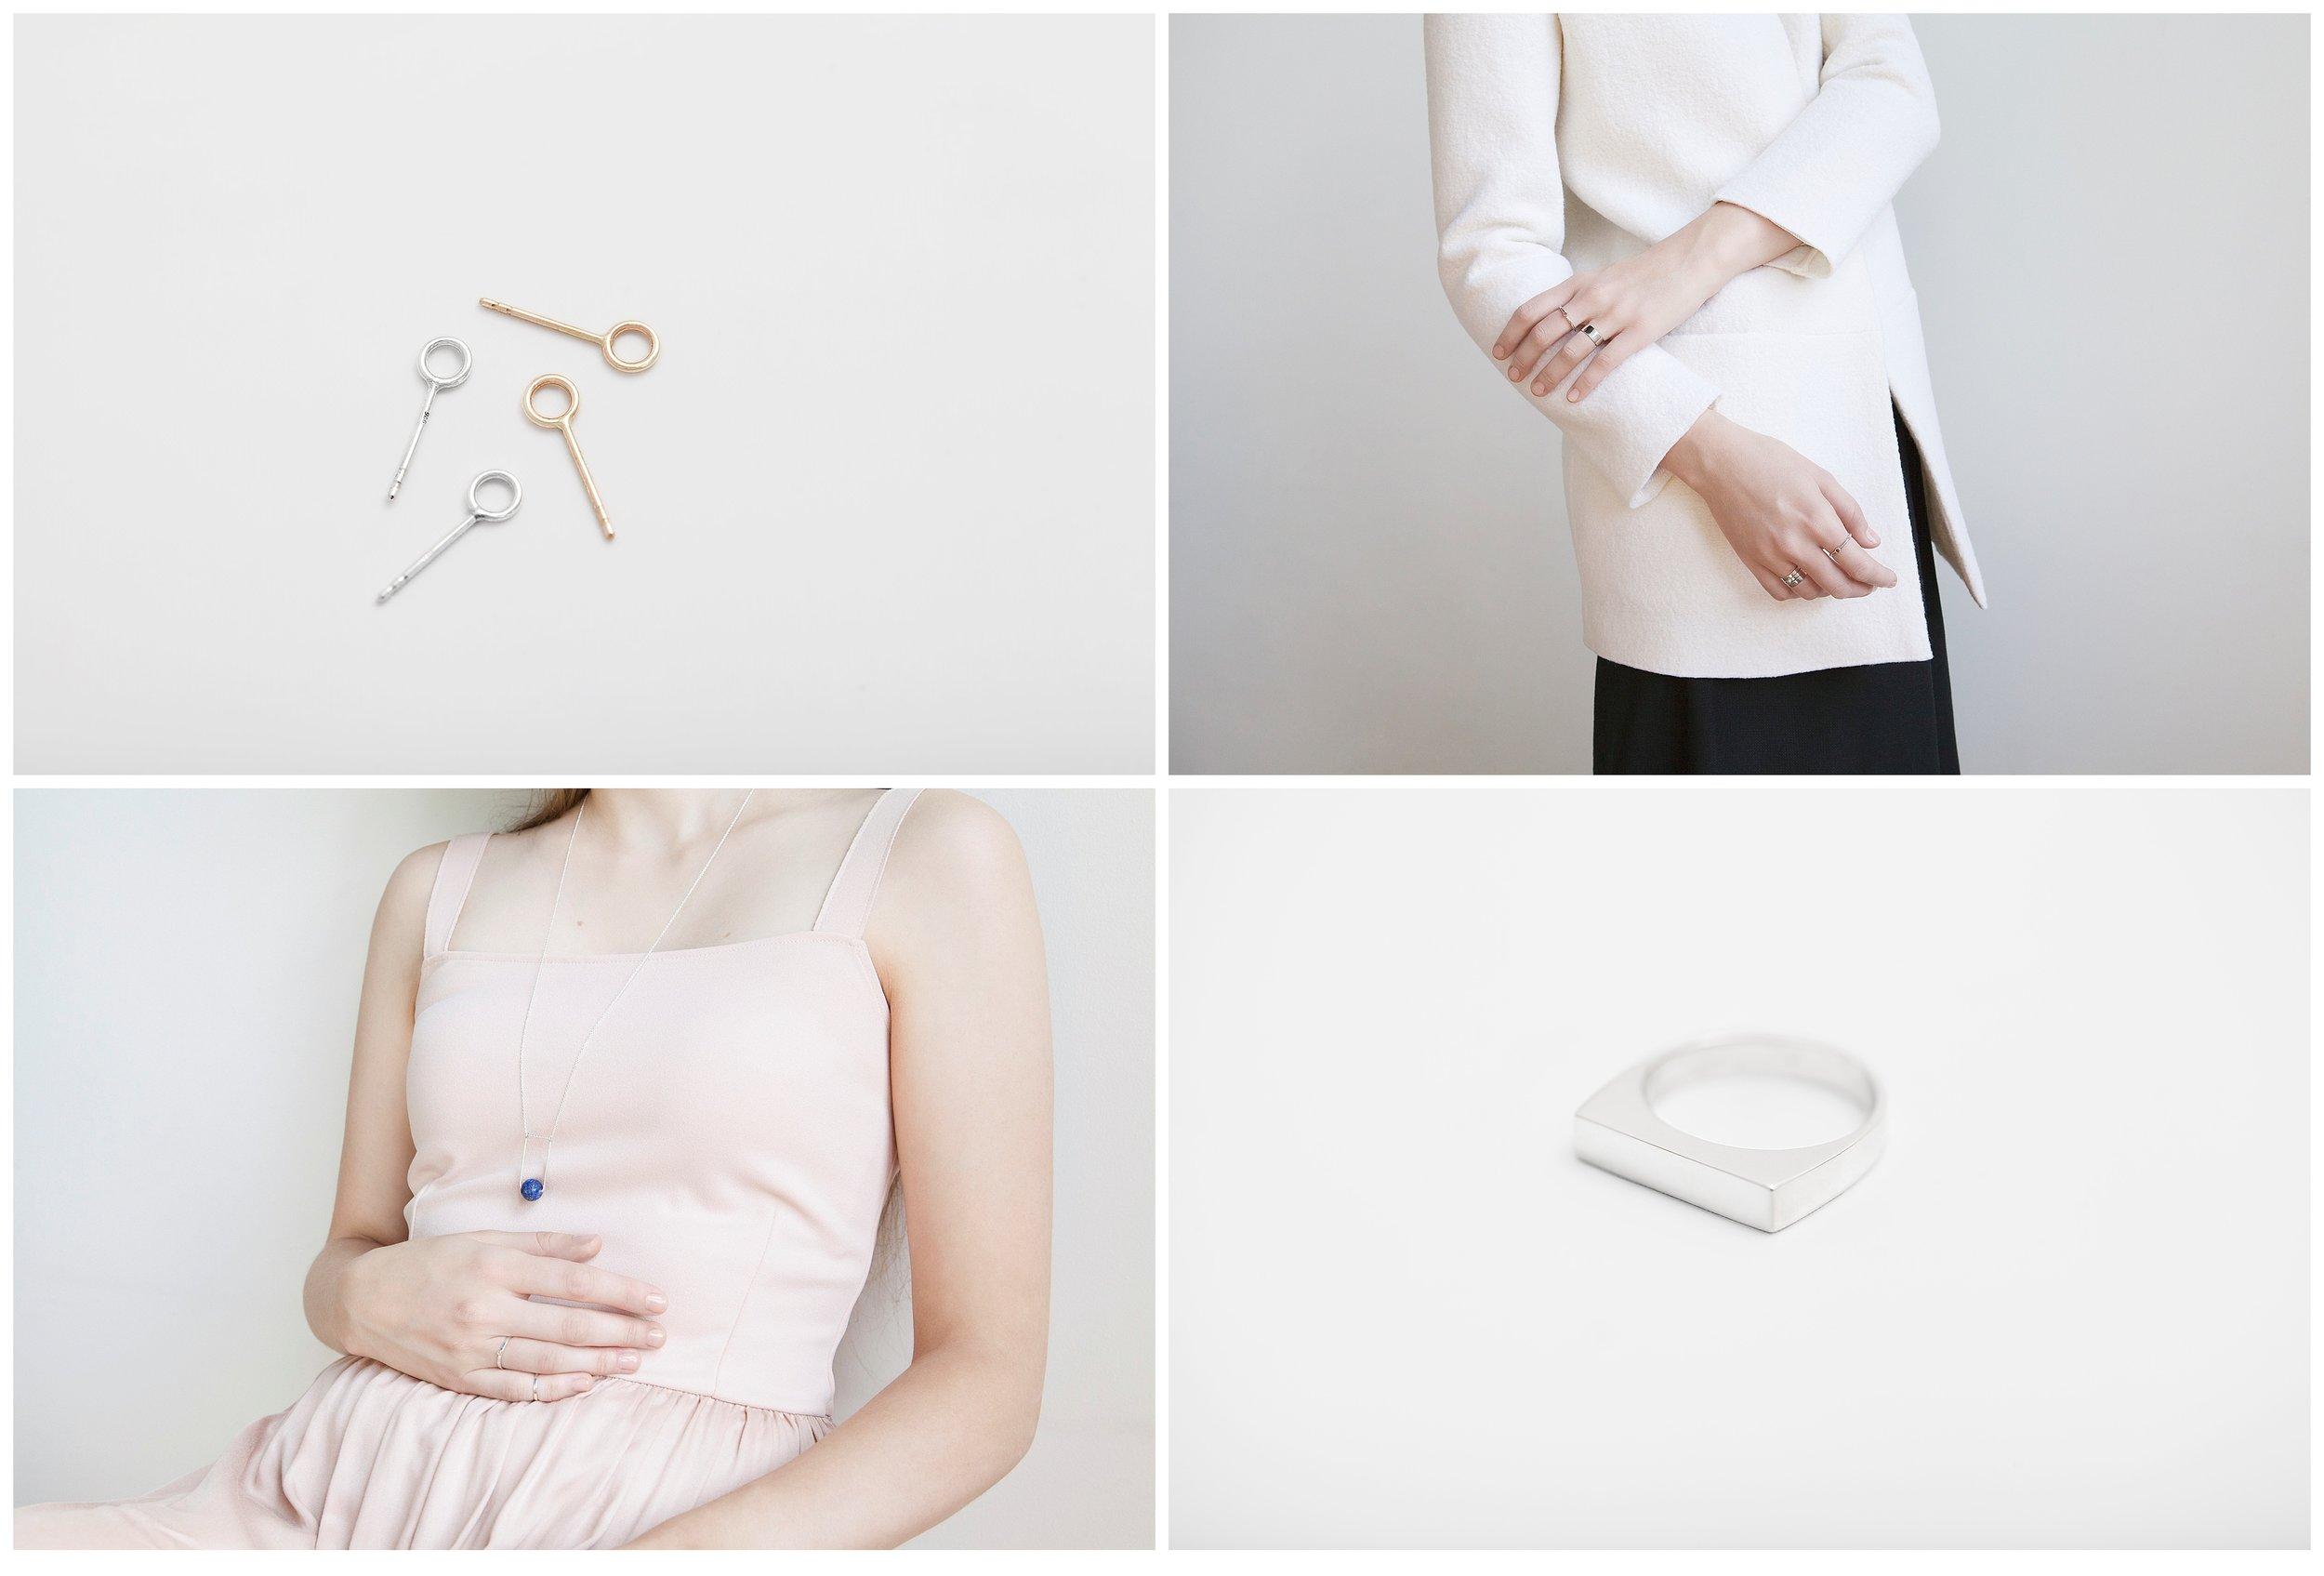 Collection Ora | Pauze Atelier